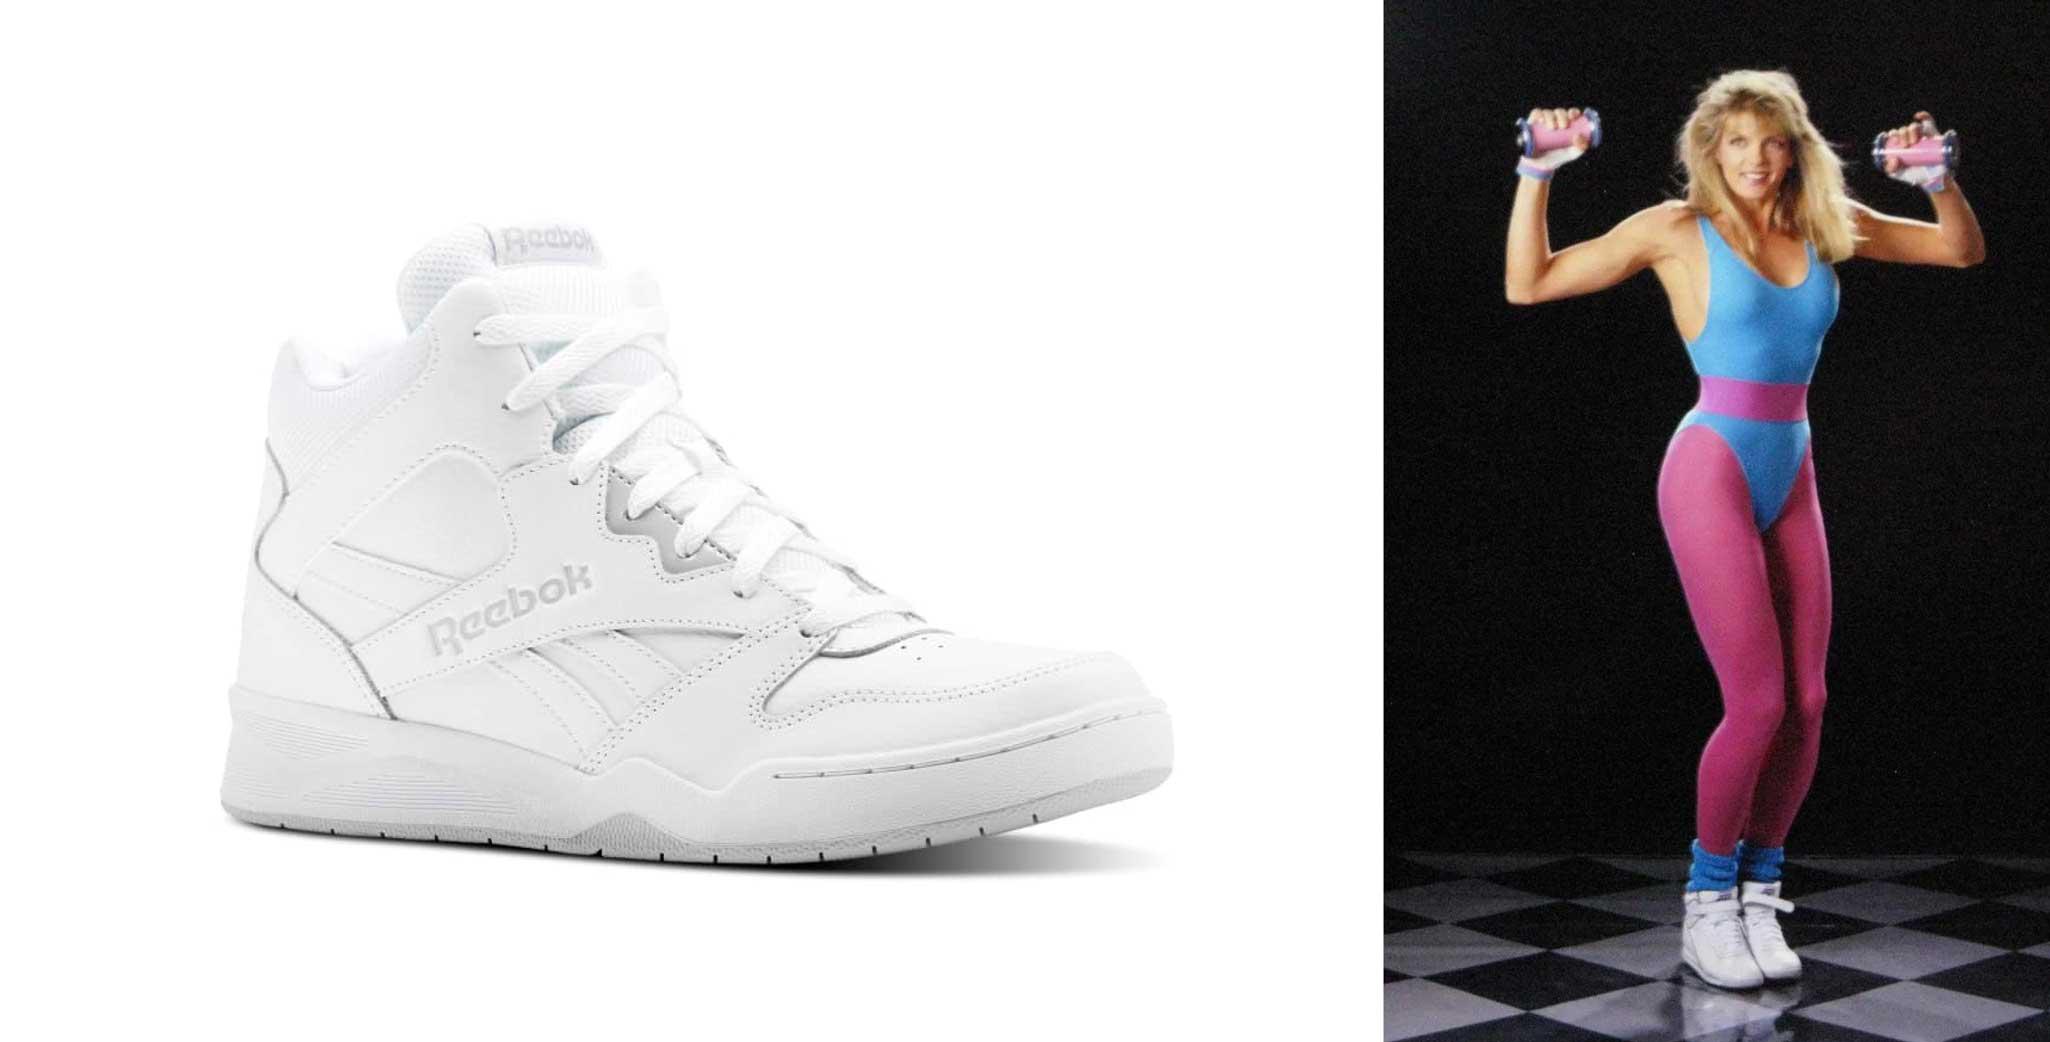 Sneakers - 1980s women shoes